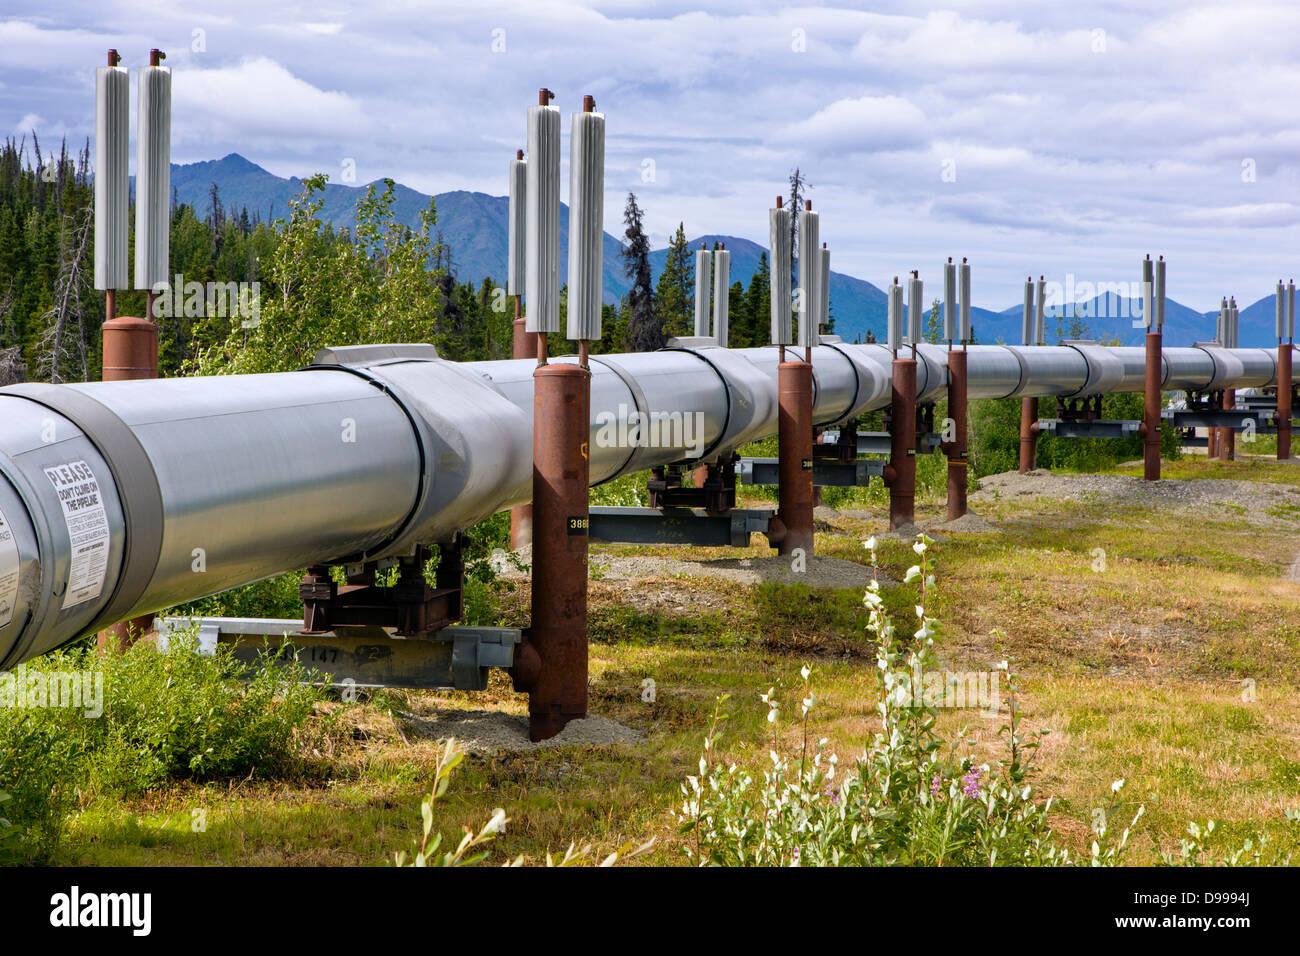 Aleyska, or Trans - Alaska Pipeline, Chugach Mountains, north of Valdez, Alaska, USA - Stock Image